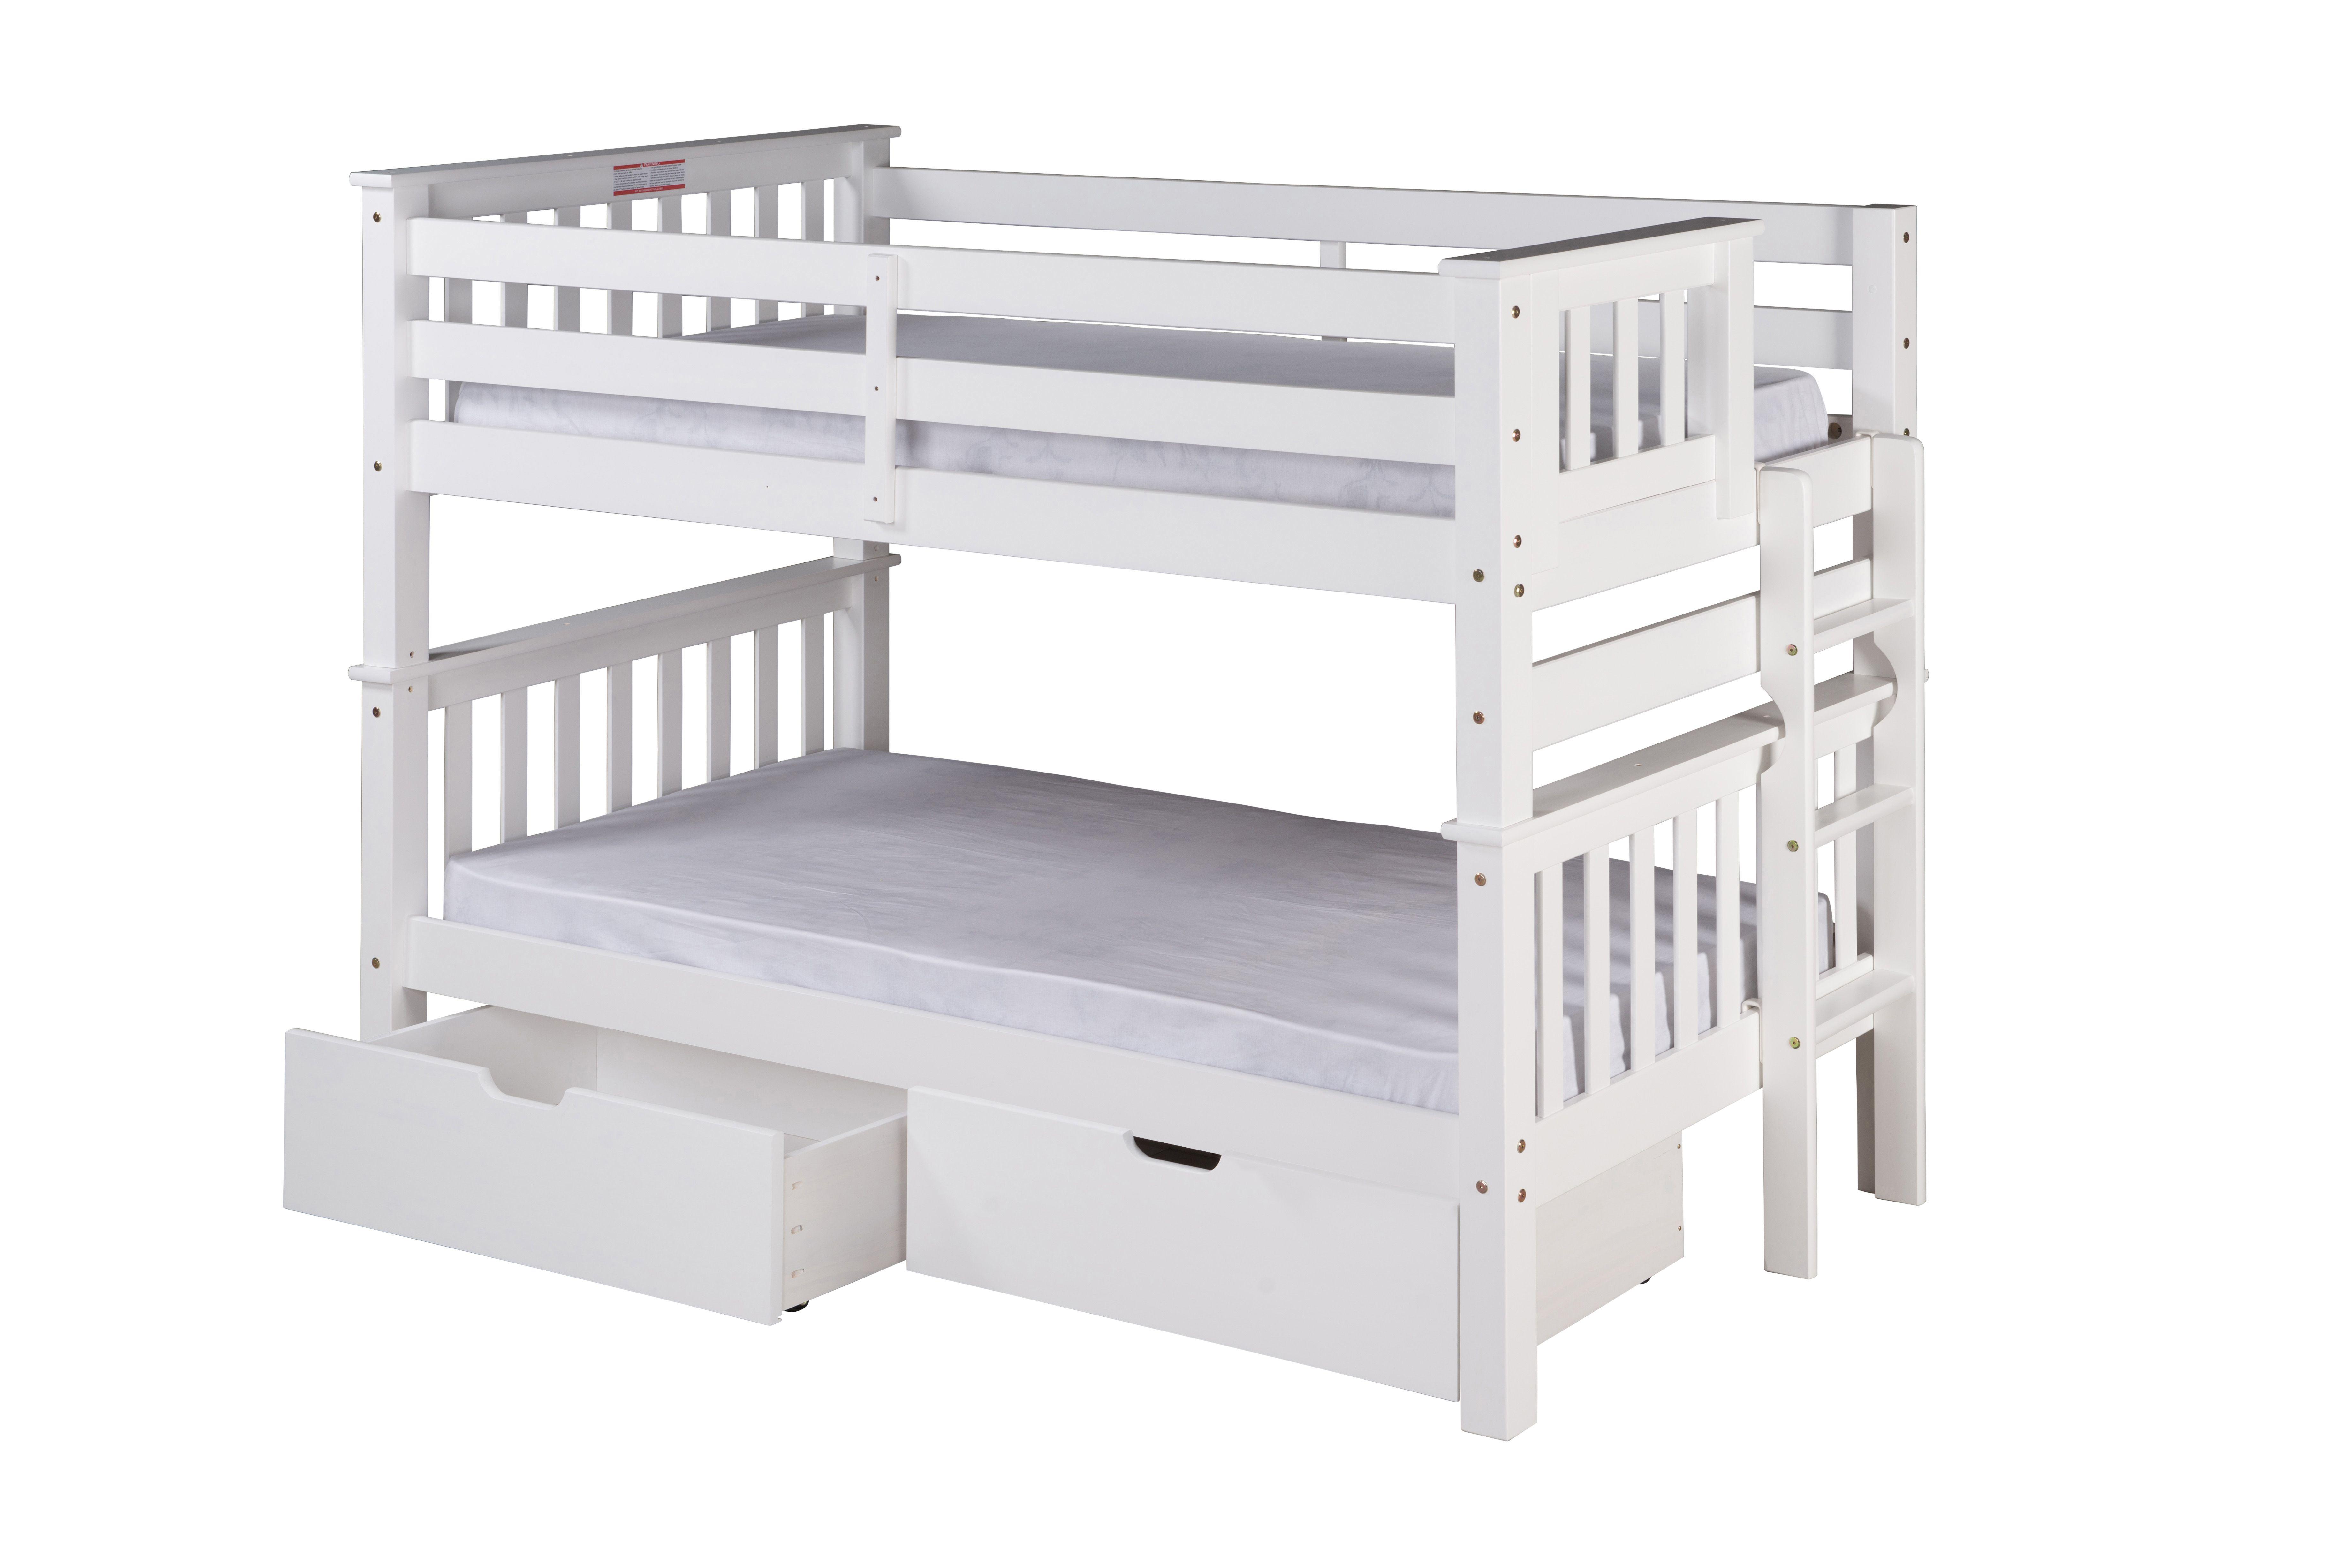 Etagenbett Für Puppenhaus : Dorel twin Über voll metall etagenbett bett bunk